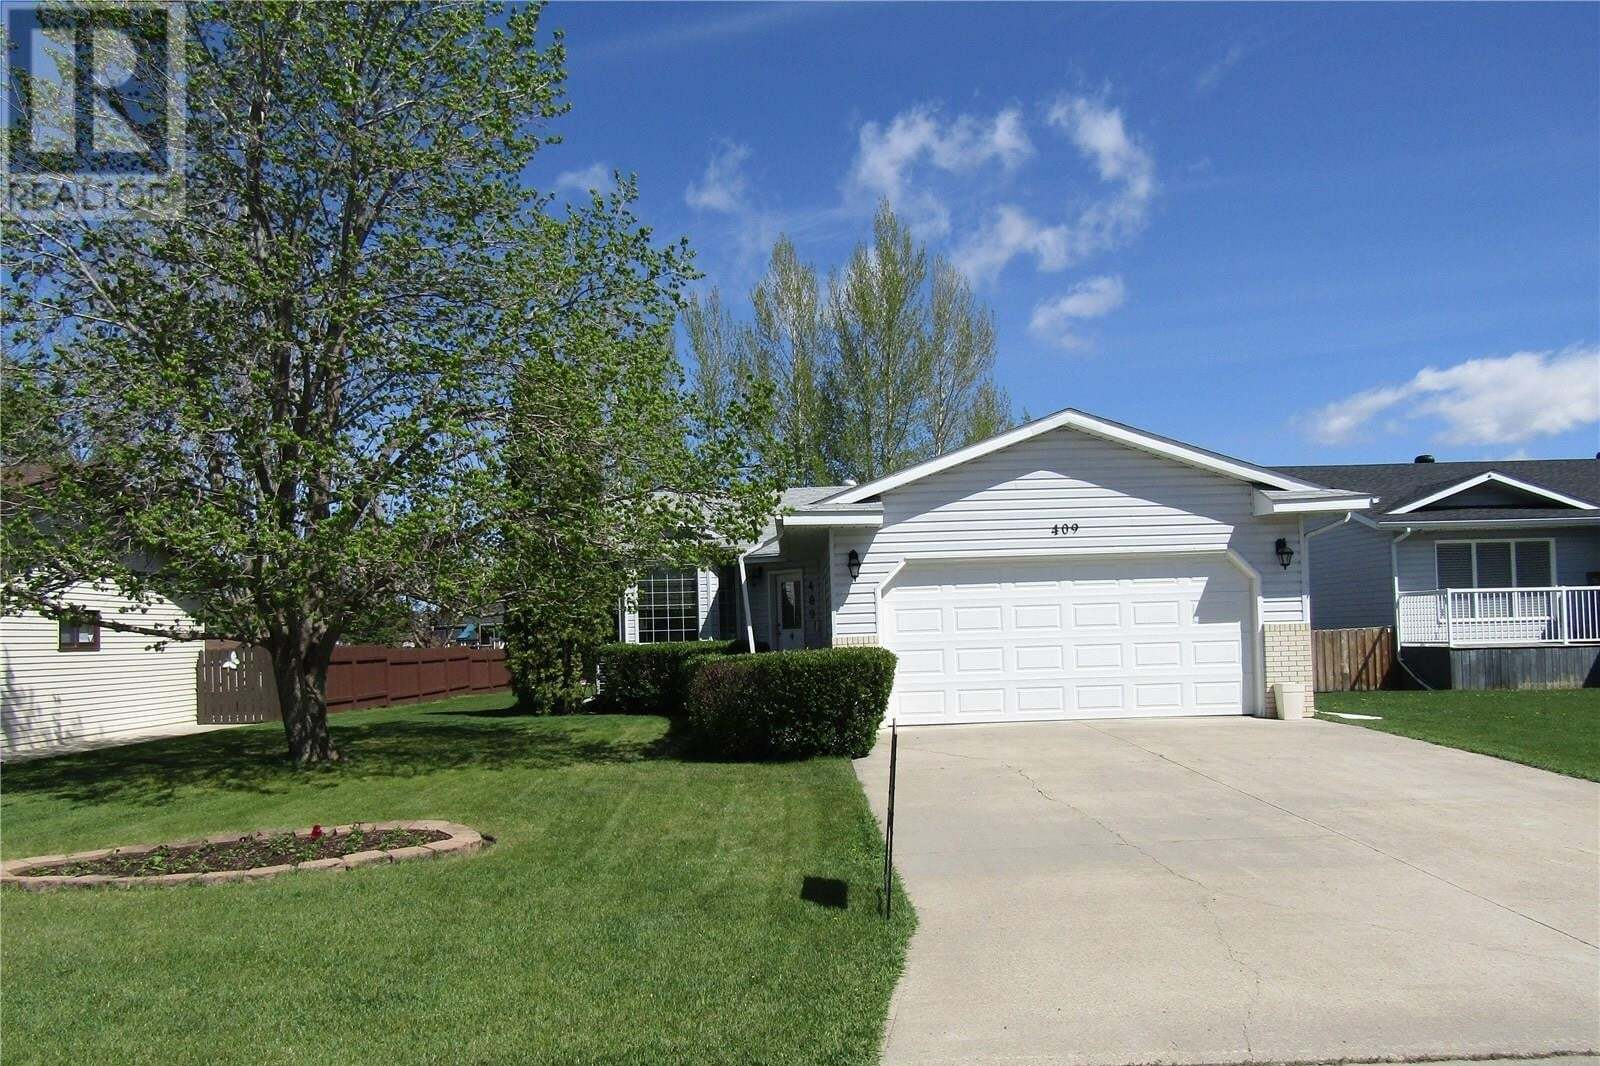 House for sale at 409 Watson Cres Nipawin Saskatchewan - MLS: SK810277